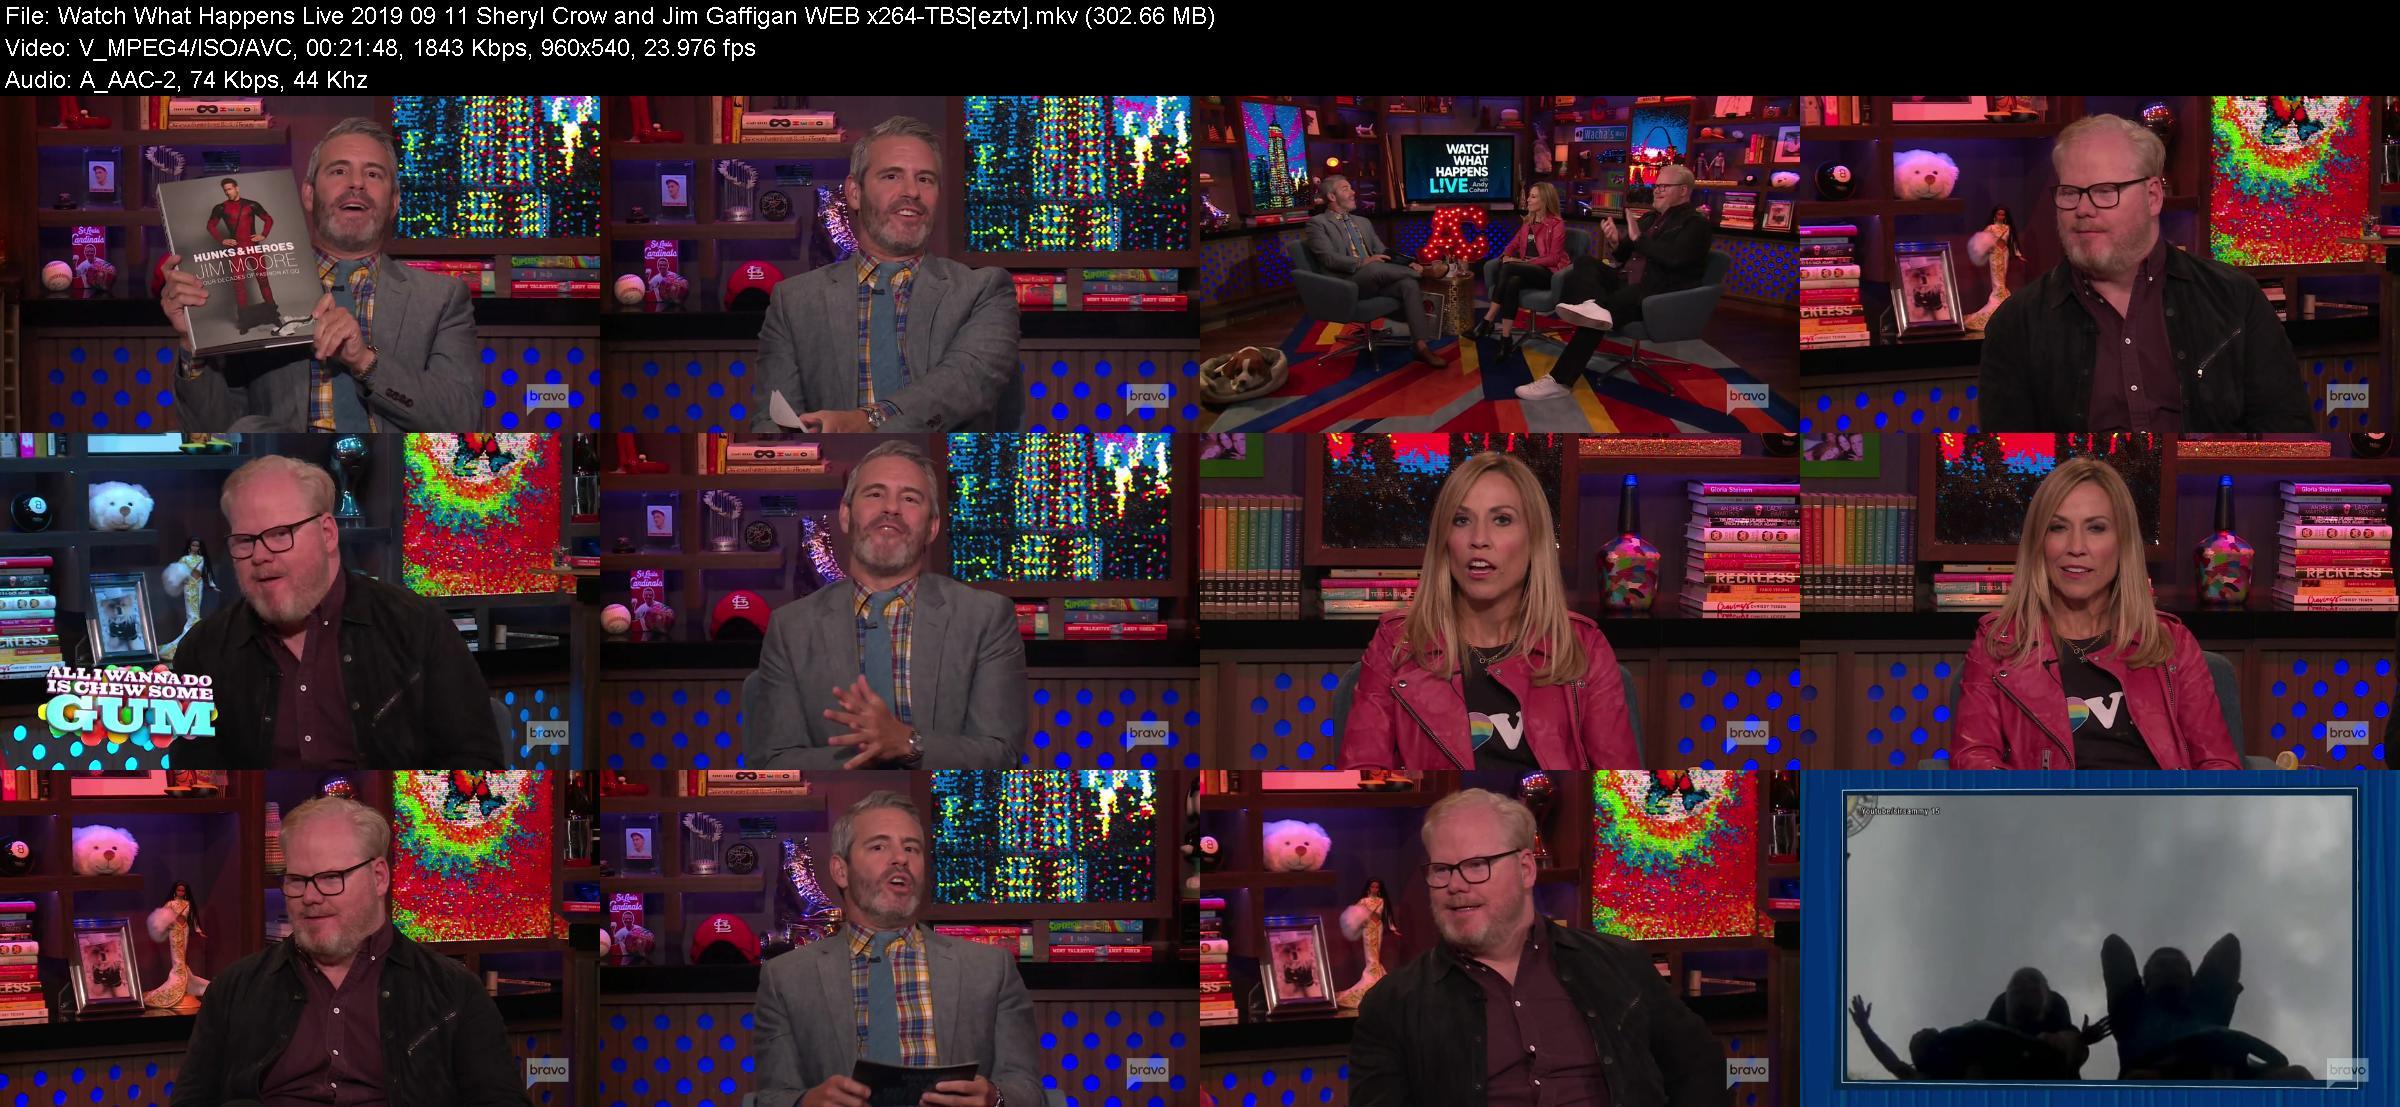 Watch What Happens Live 2019 09 11 Sheryl Crow and Jim Gaffigan WEB x264 TBS